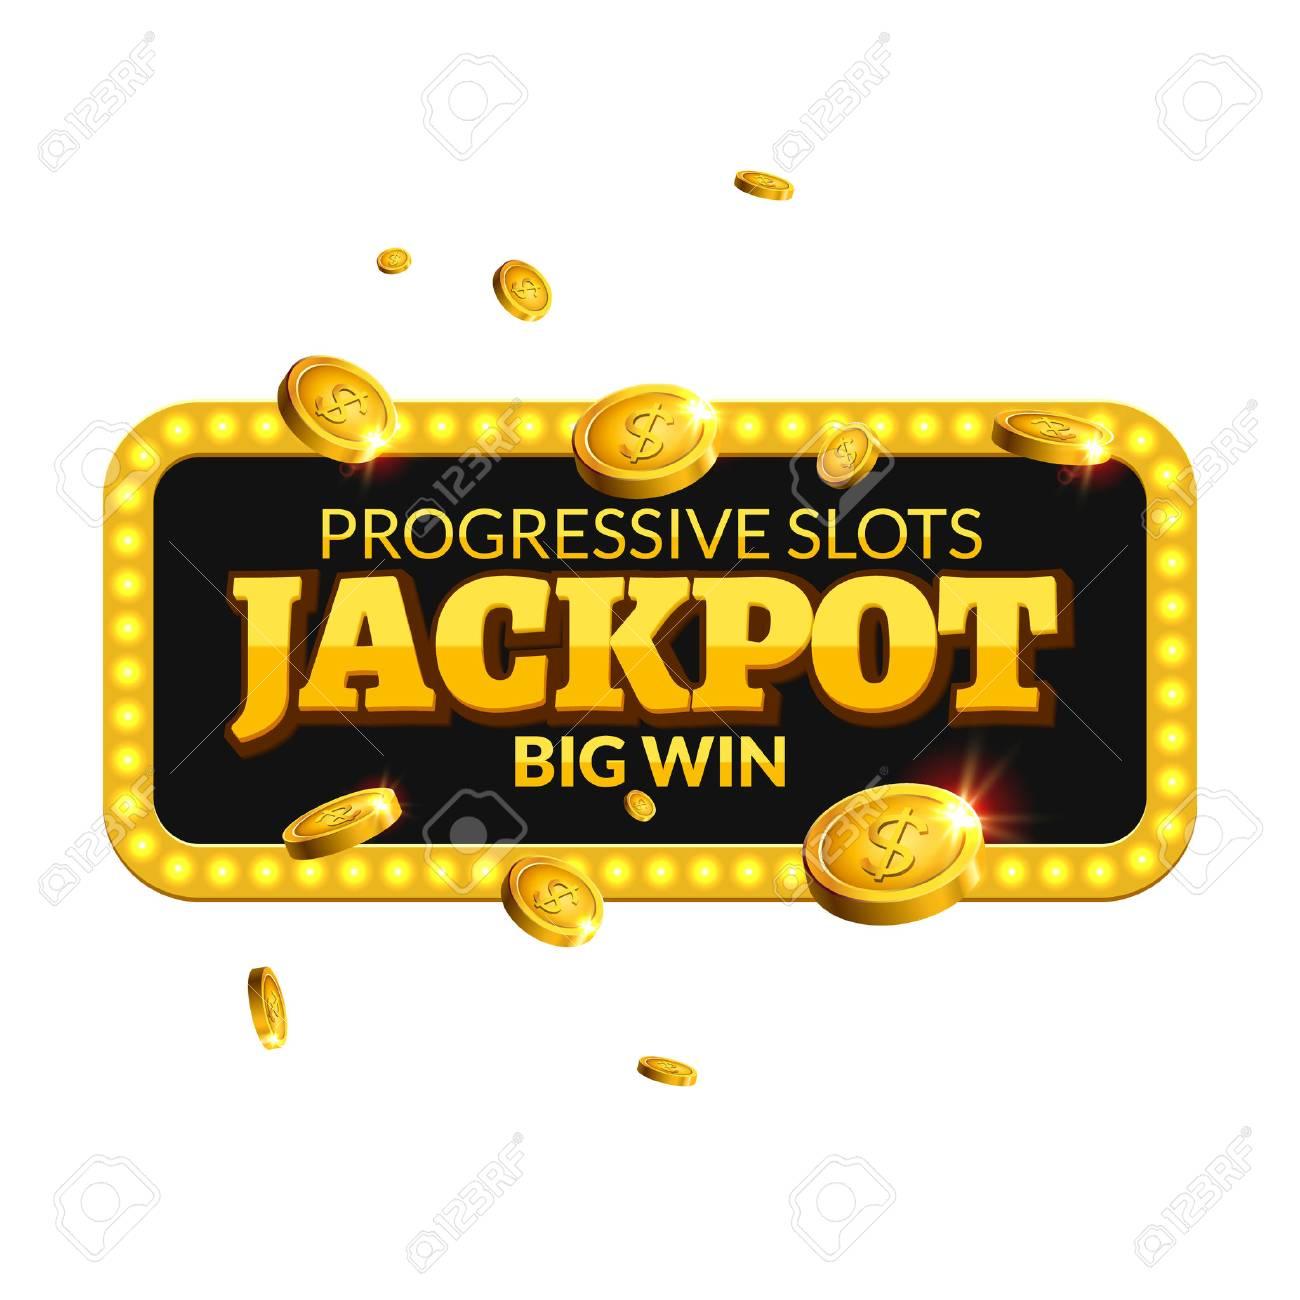 Jackpot Casino Label Background Sign Casino Jackpot Coins Money